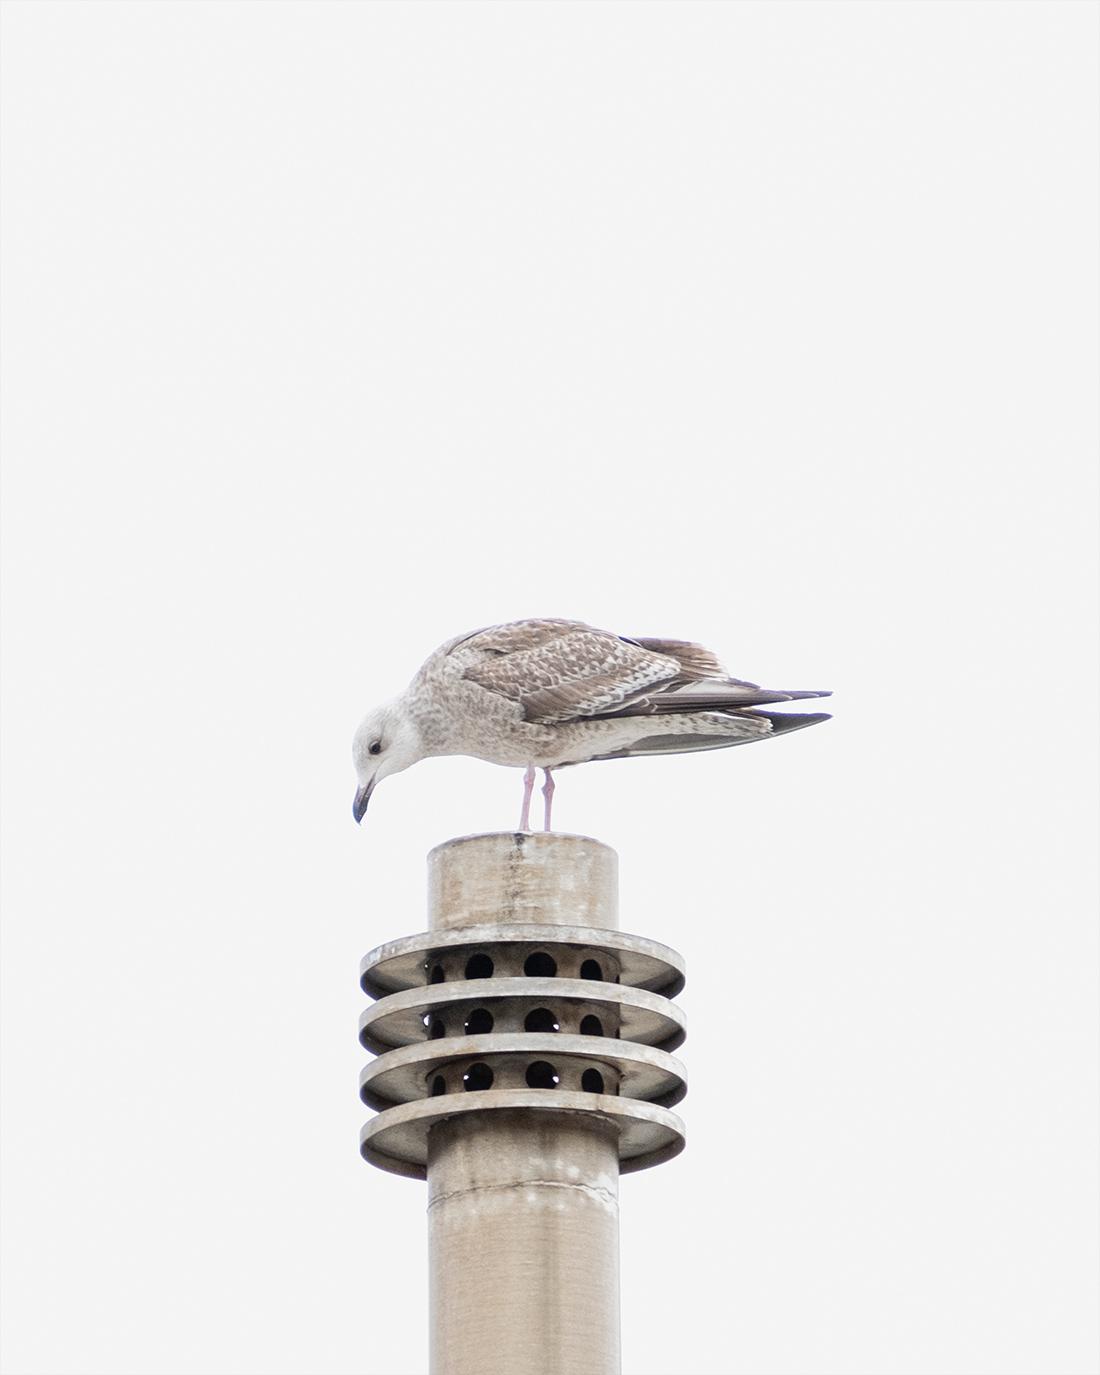 DSCF1342-2-WEB-måke-trondheim-fuglefoto-kunstfoto-cecilie-jystad